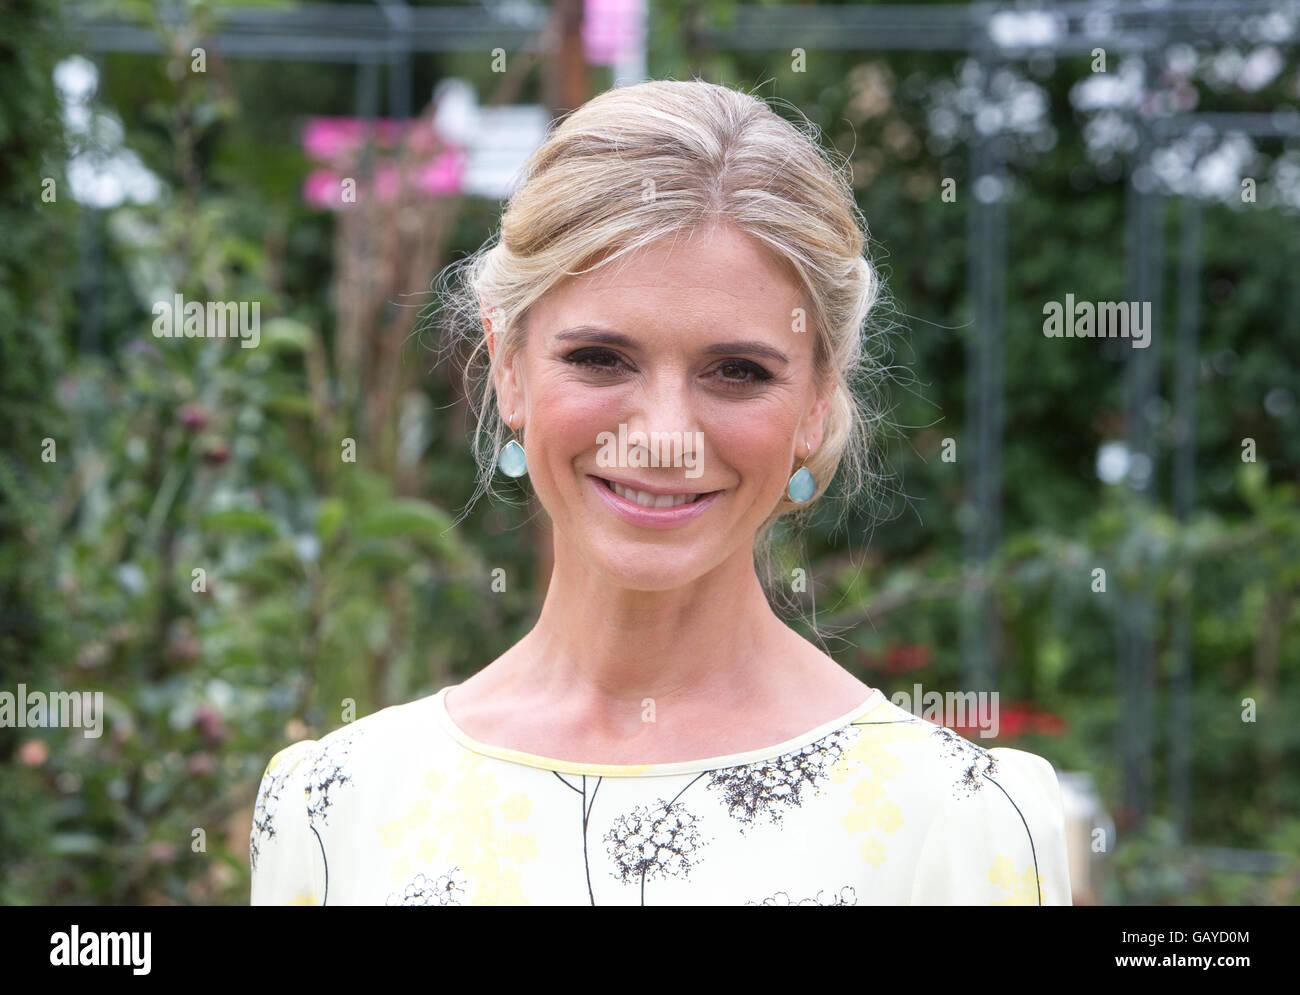 Actress Emilia Fox at The RHS Hampton Court Flower Show 2016 - Stock Image